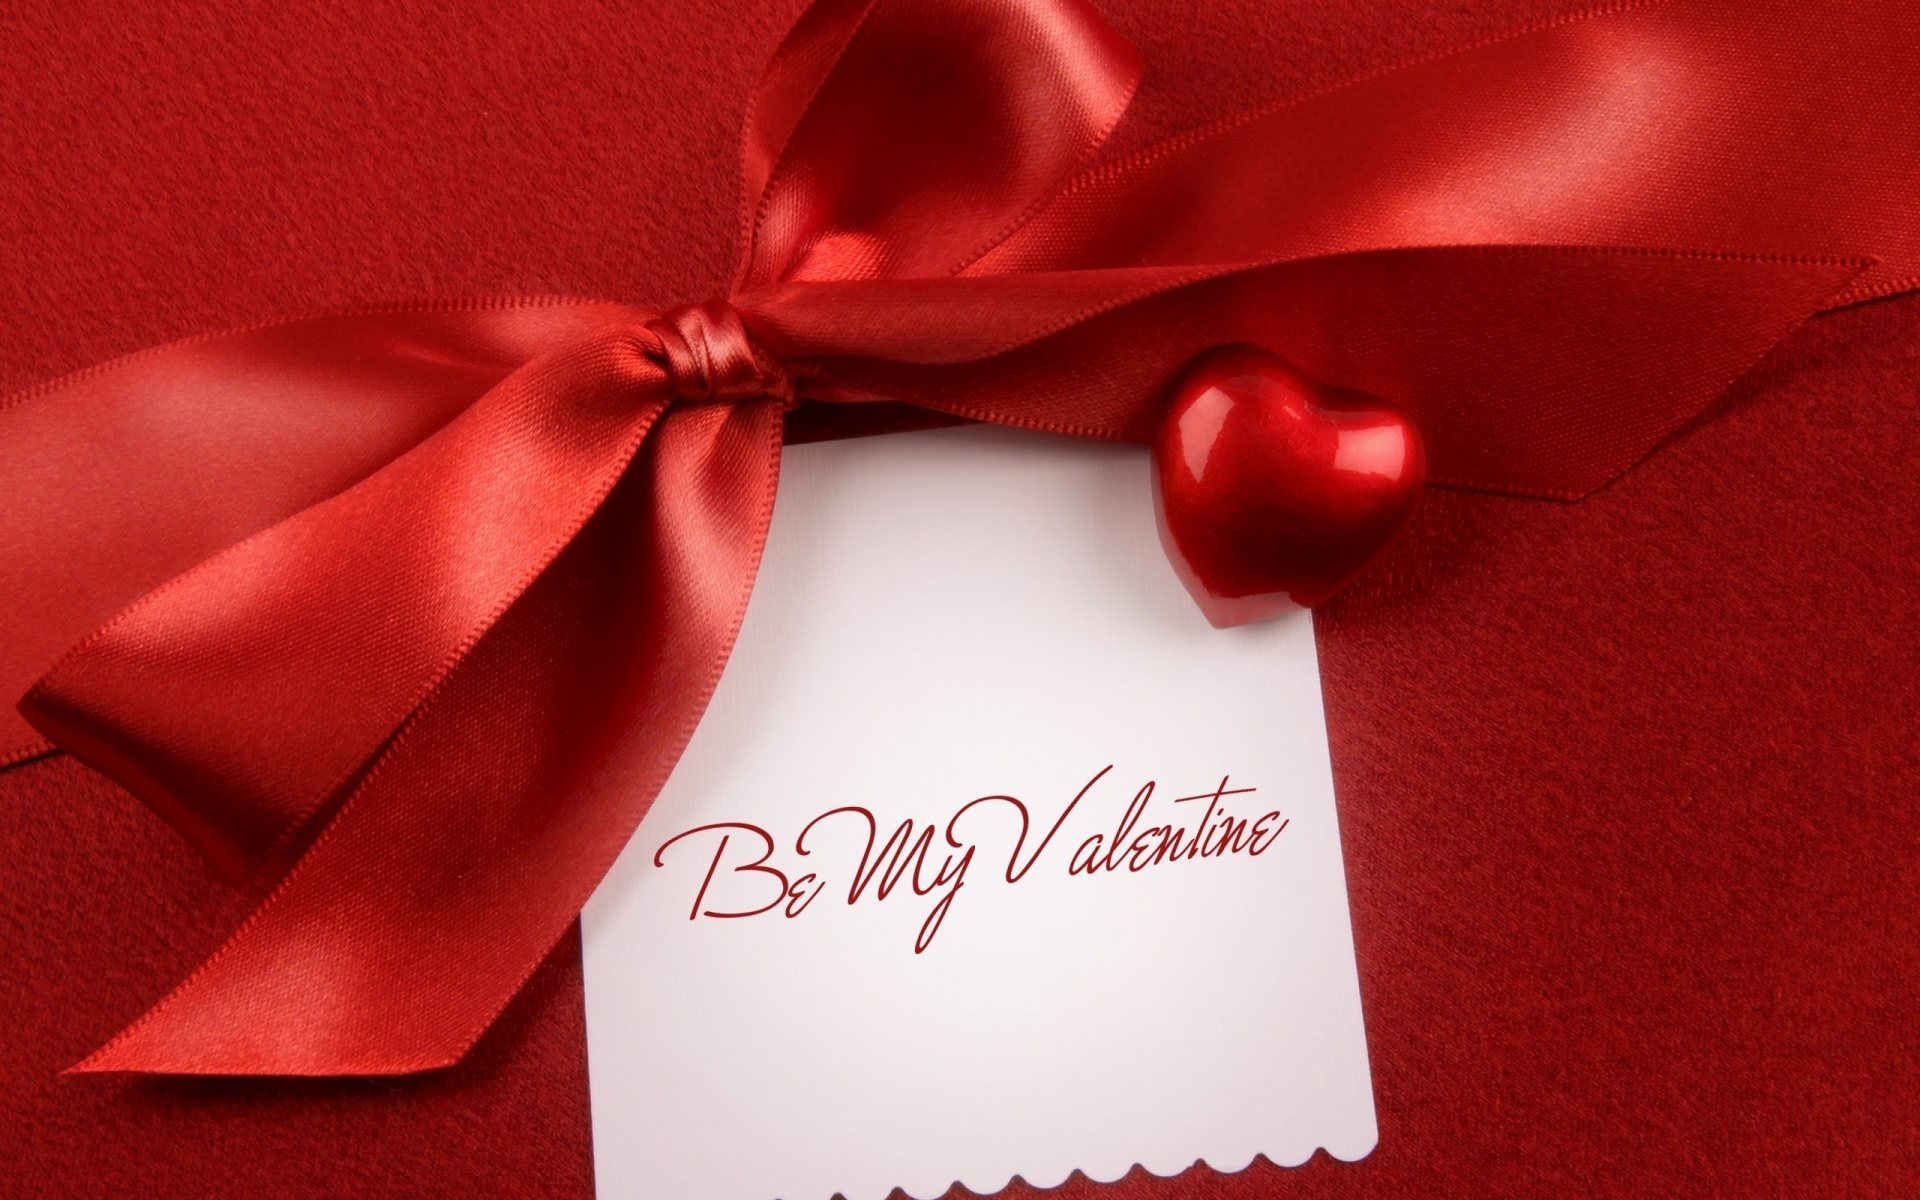 be-my-valentine-1920x1200